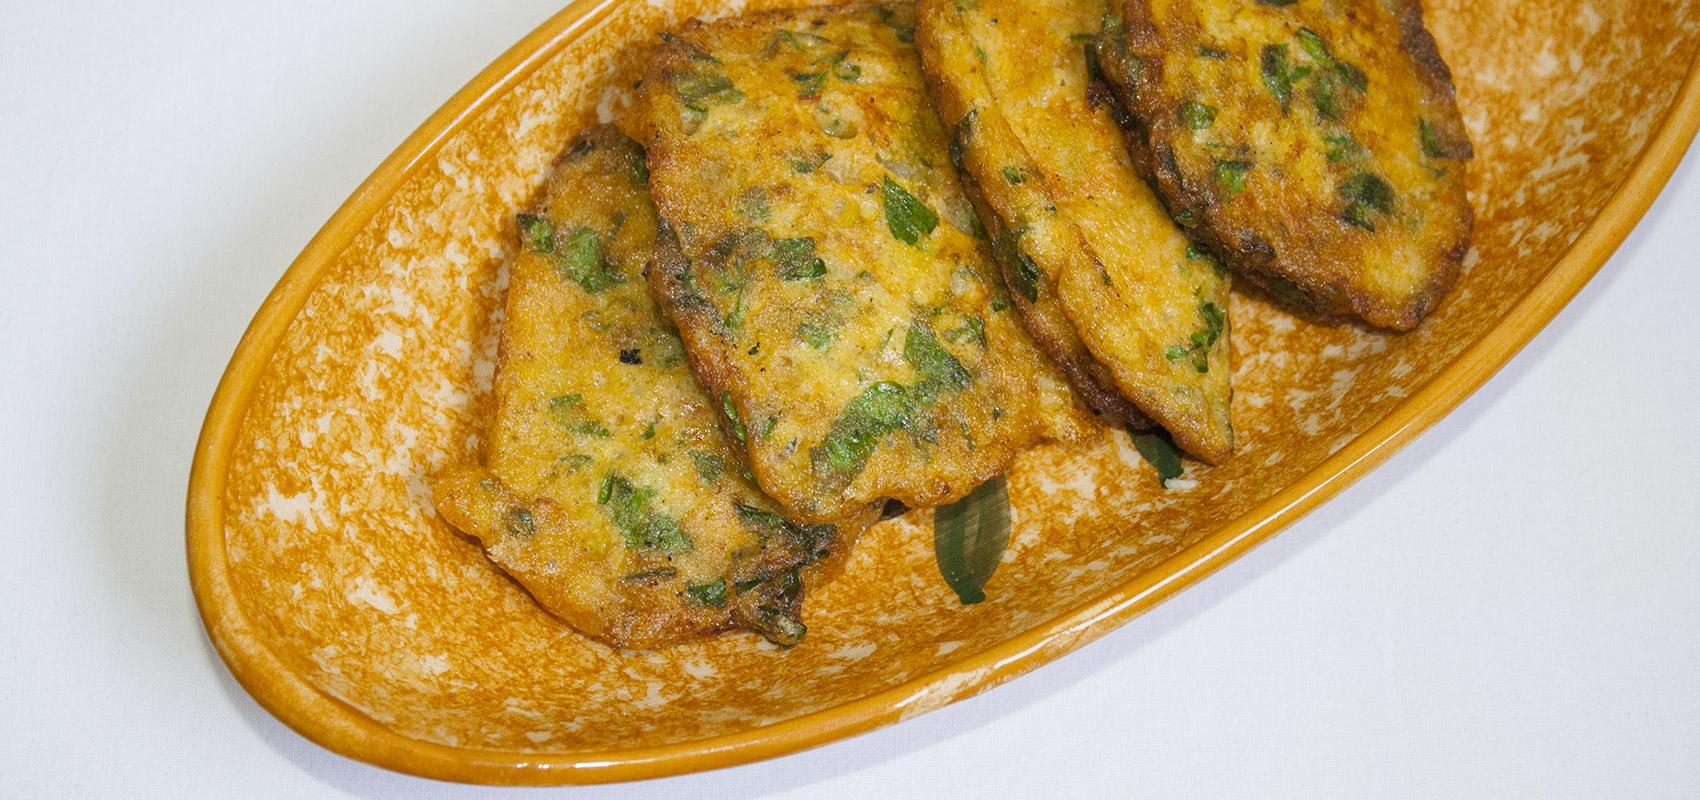 Kefta tunisienne aux pommes de terre cuisine du maghreb - Cuisine tunisienne ramadan ...